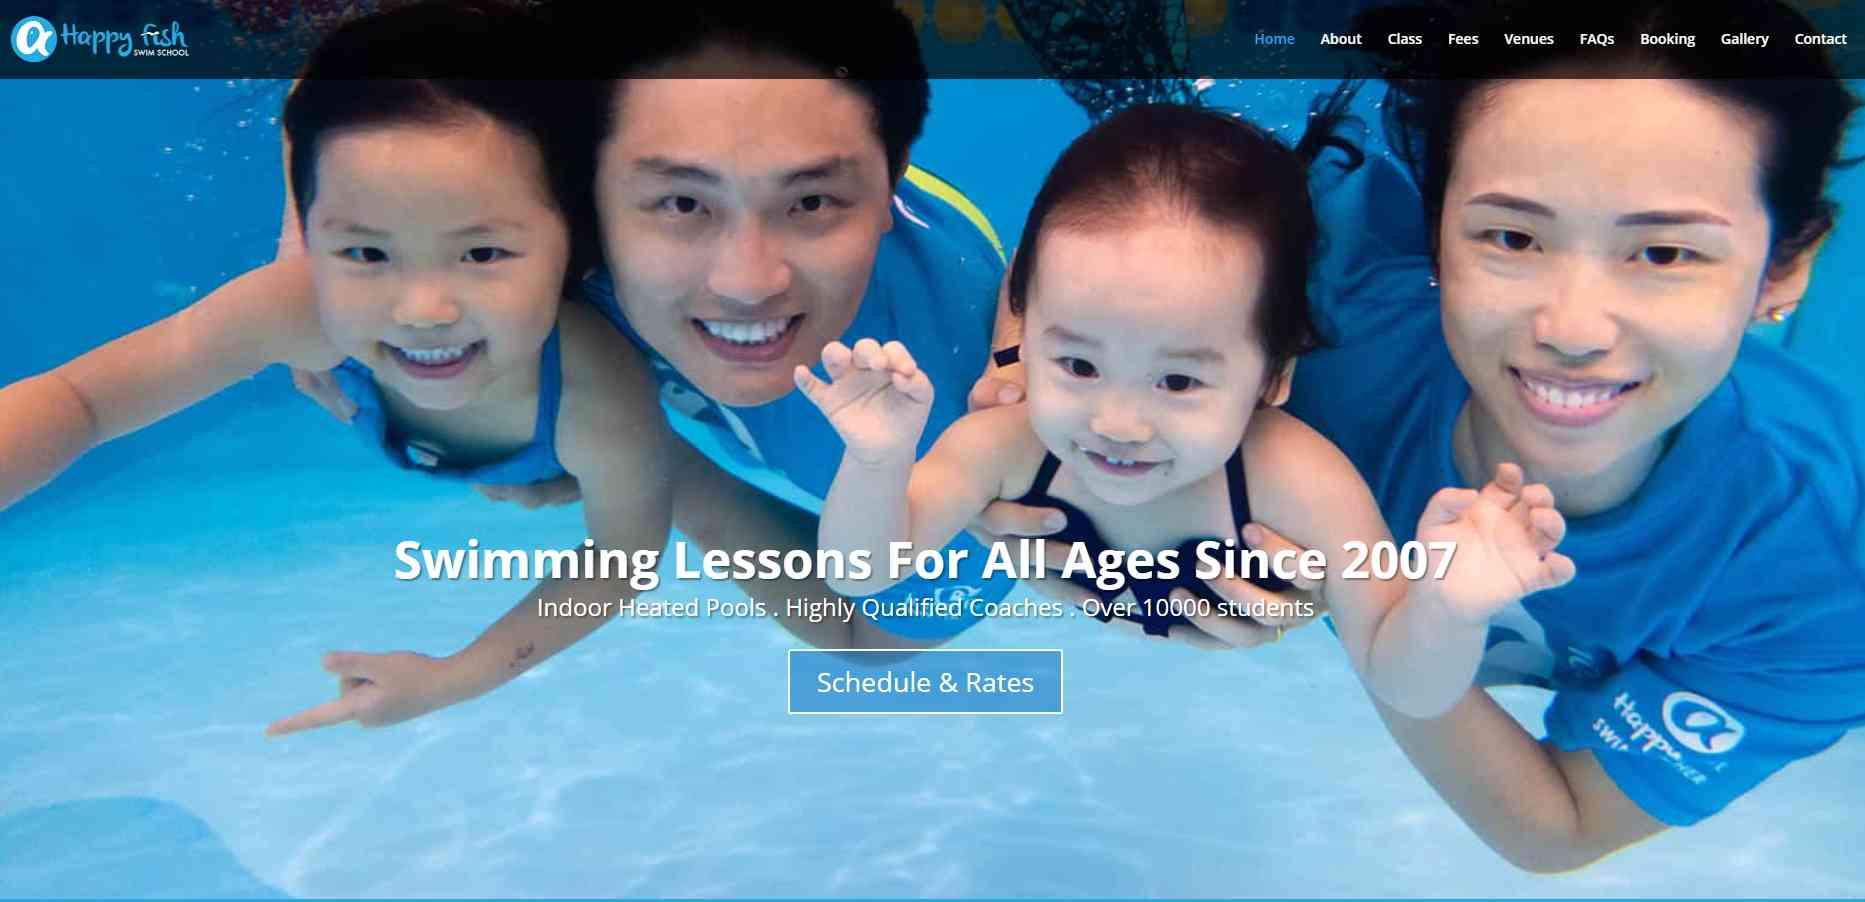 Happy Fish Top Swimming Schools in Singapore